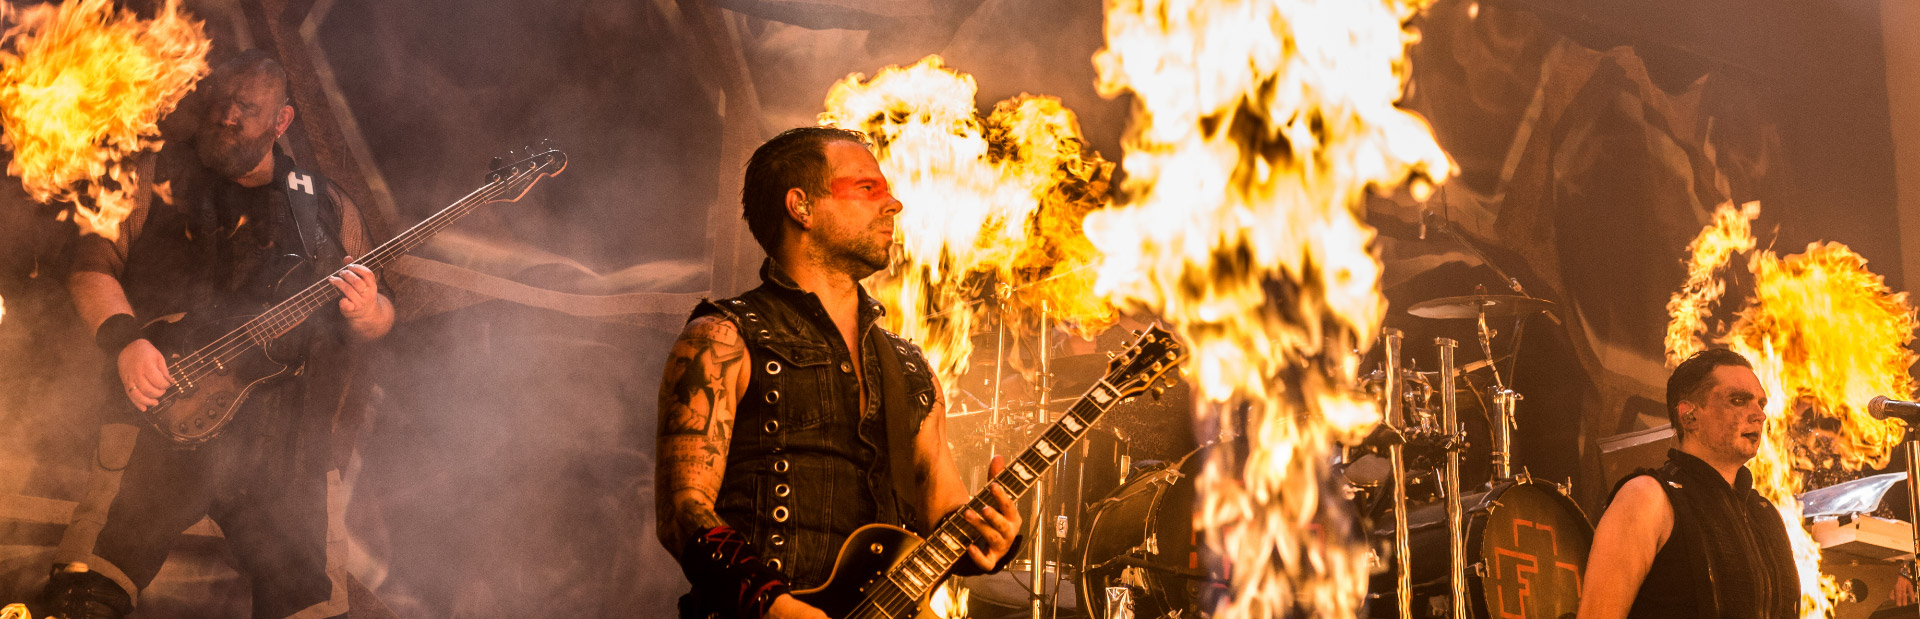 daniel-in-flammen